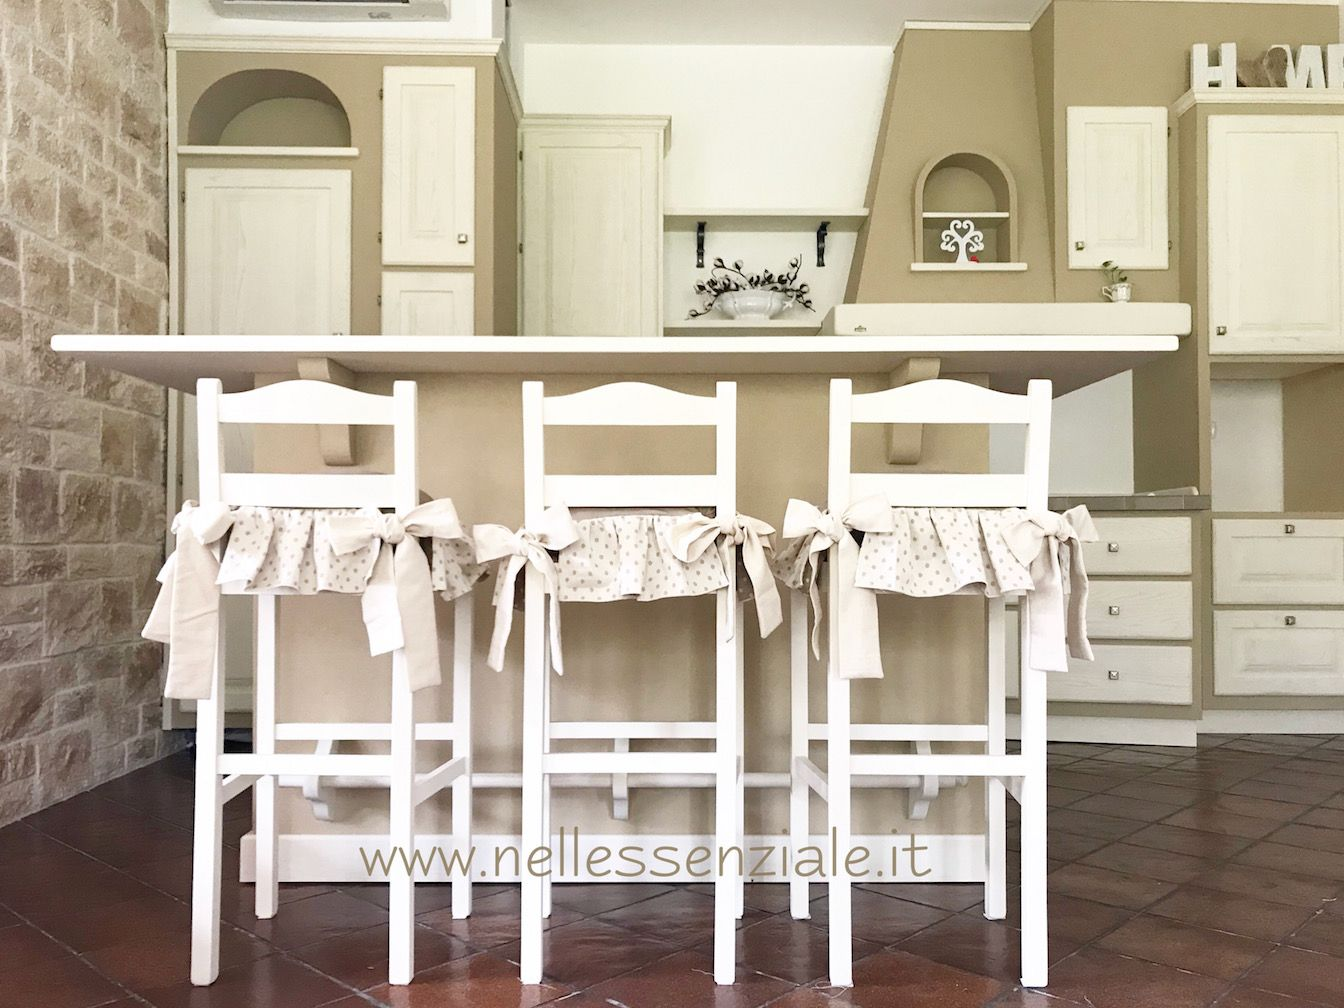 Cuscini per cucina open space in muratura | Etsy handmade, Shabby ...